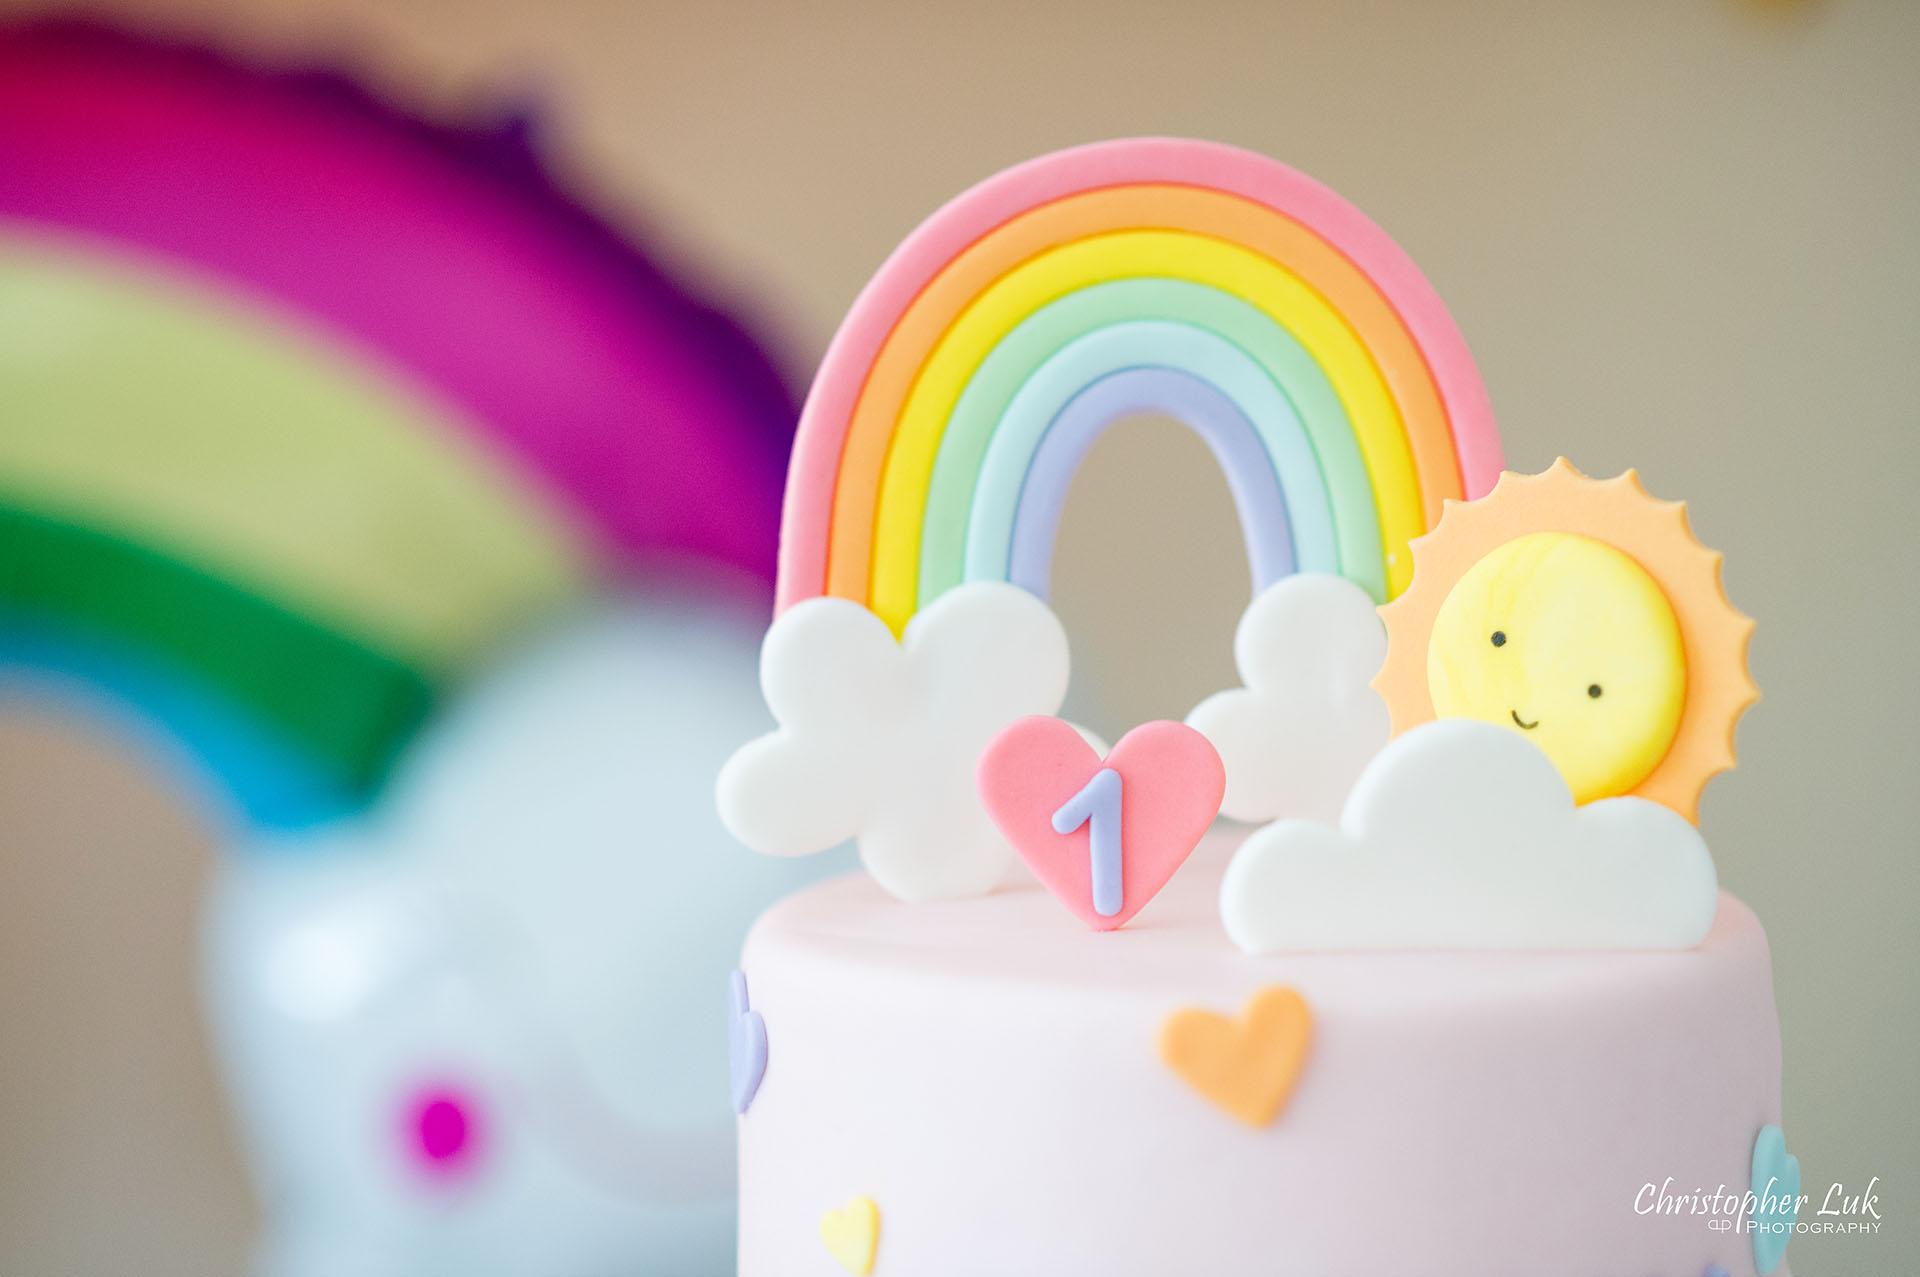 Christopher Luk Toronto Markham Family Photographer Baby Girl First Birthday Balloon Arch Rainbow Pink Sun Clouds Decor Details